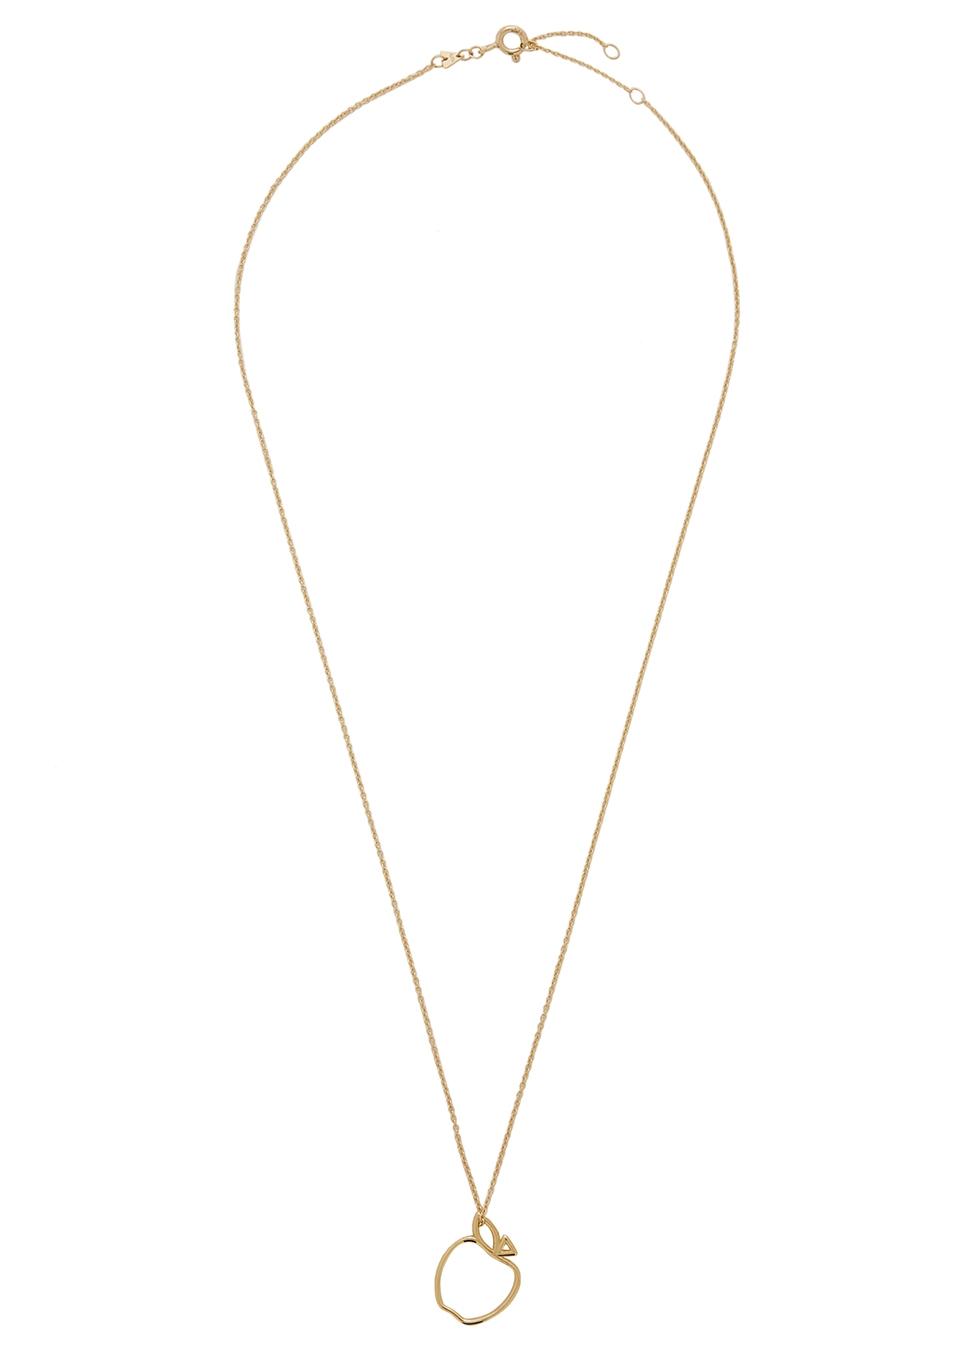 Manzana 9kt gold necklace